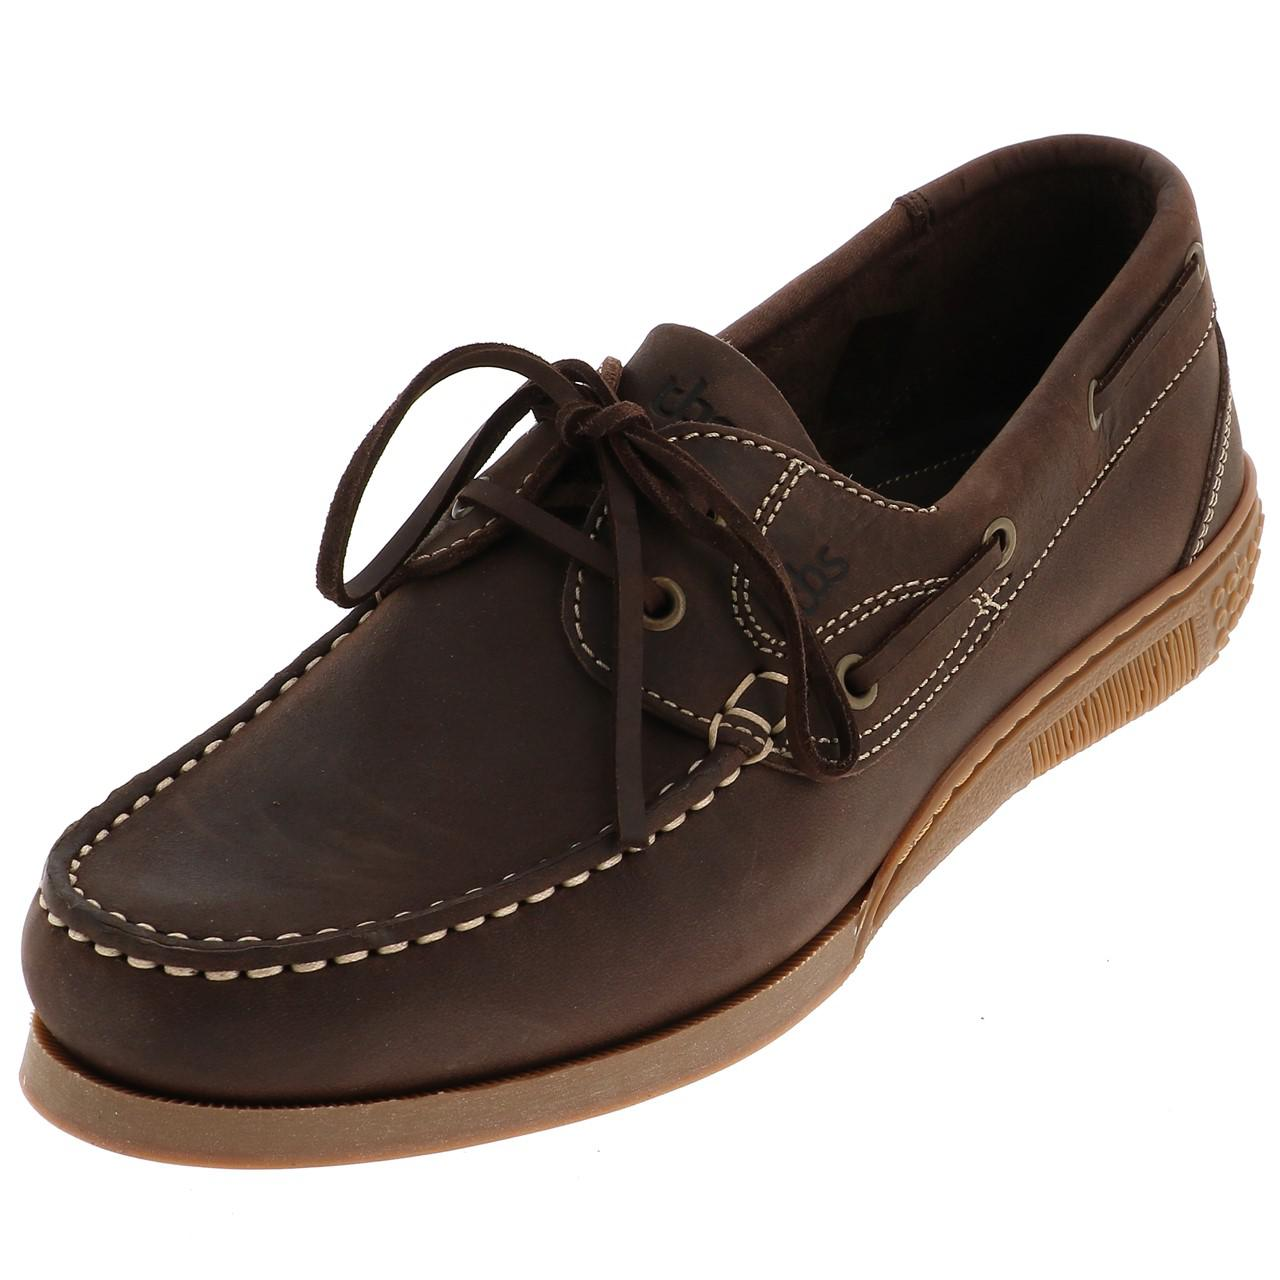 Chaussures basses toile Tbs Restart ecorce toile Vert 18329 Neuf